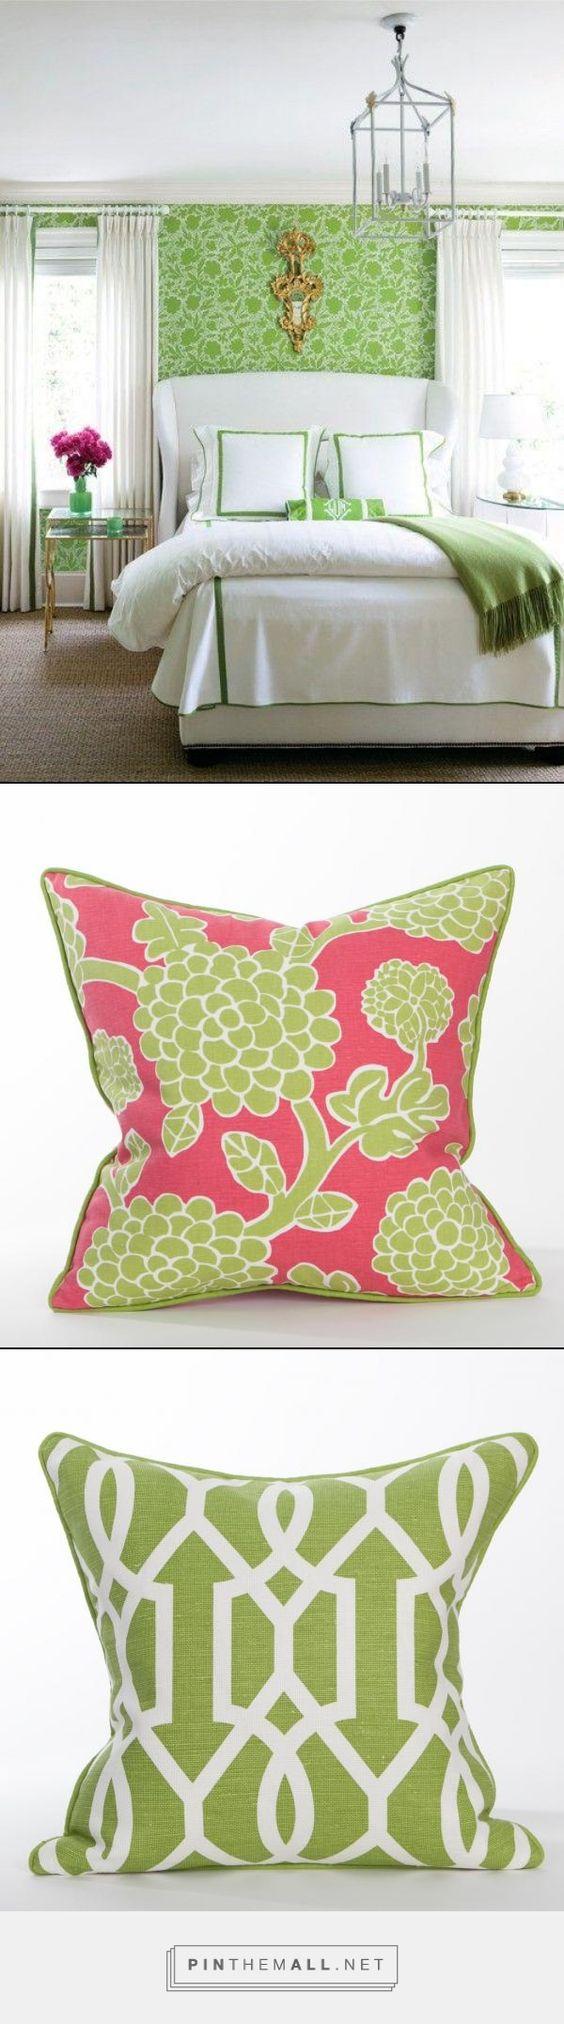 Inspiration - Palm Beach Style @ Coastal Home Pillows - Coastal Lifestyle and Inspiration ...